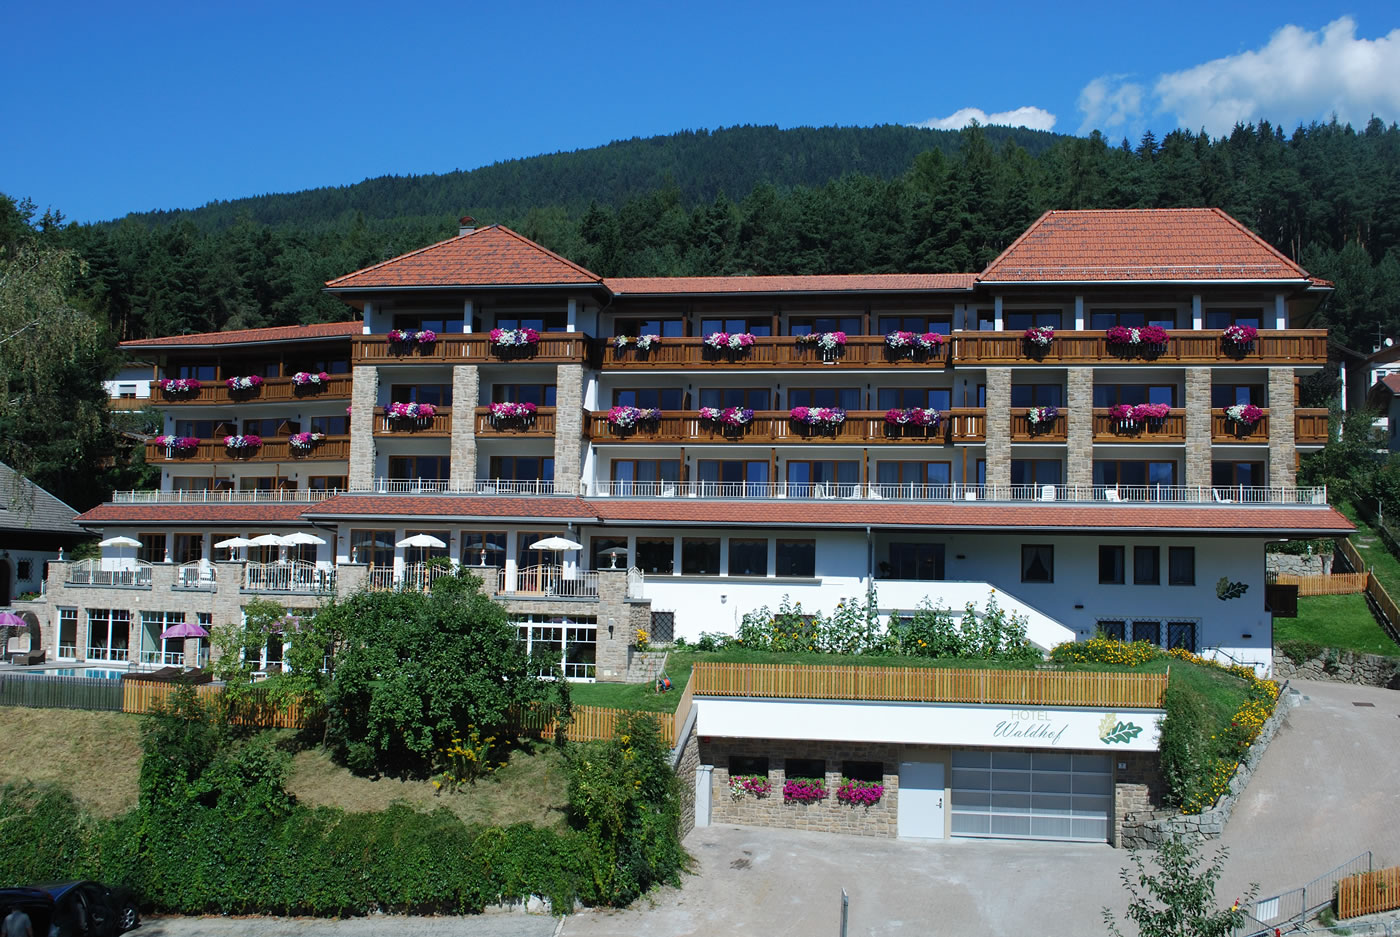 Hotel Waldhof – Percha 2013